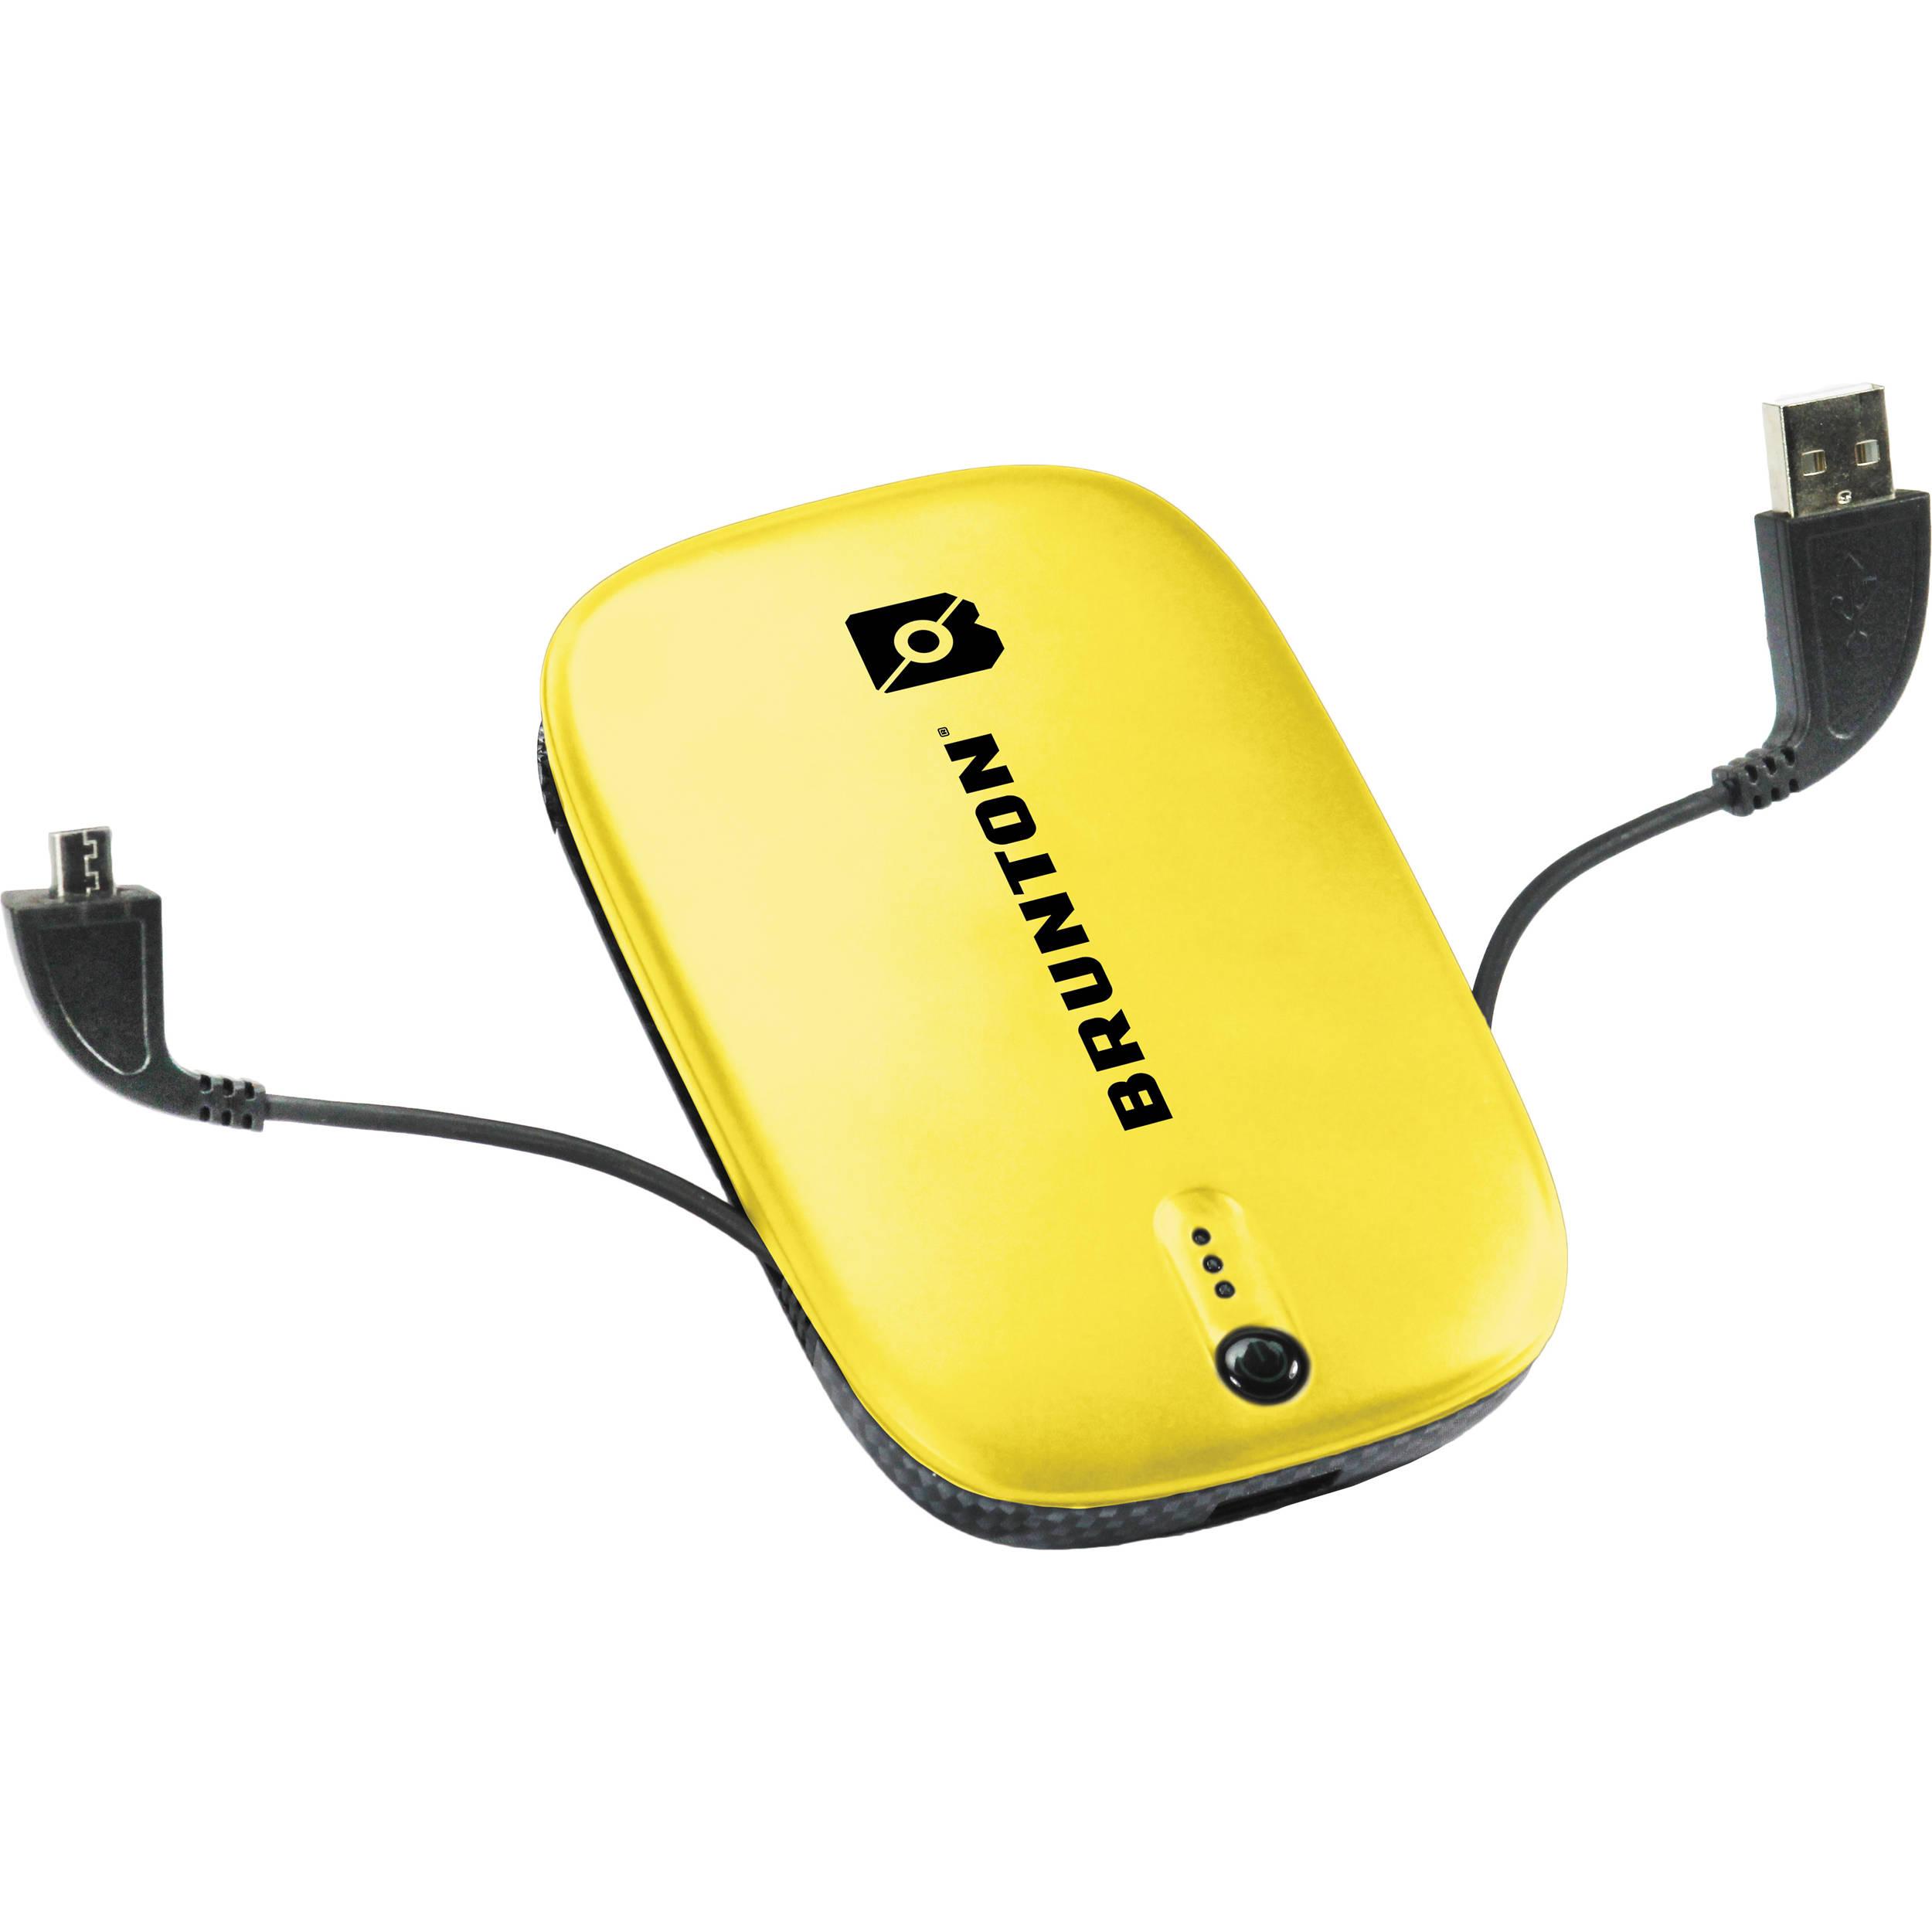 Brunton Heavy Metal 5500 Rechargeable Battery Pack (Yellow)